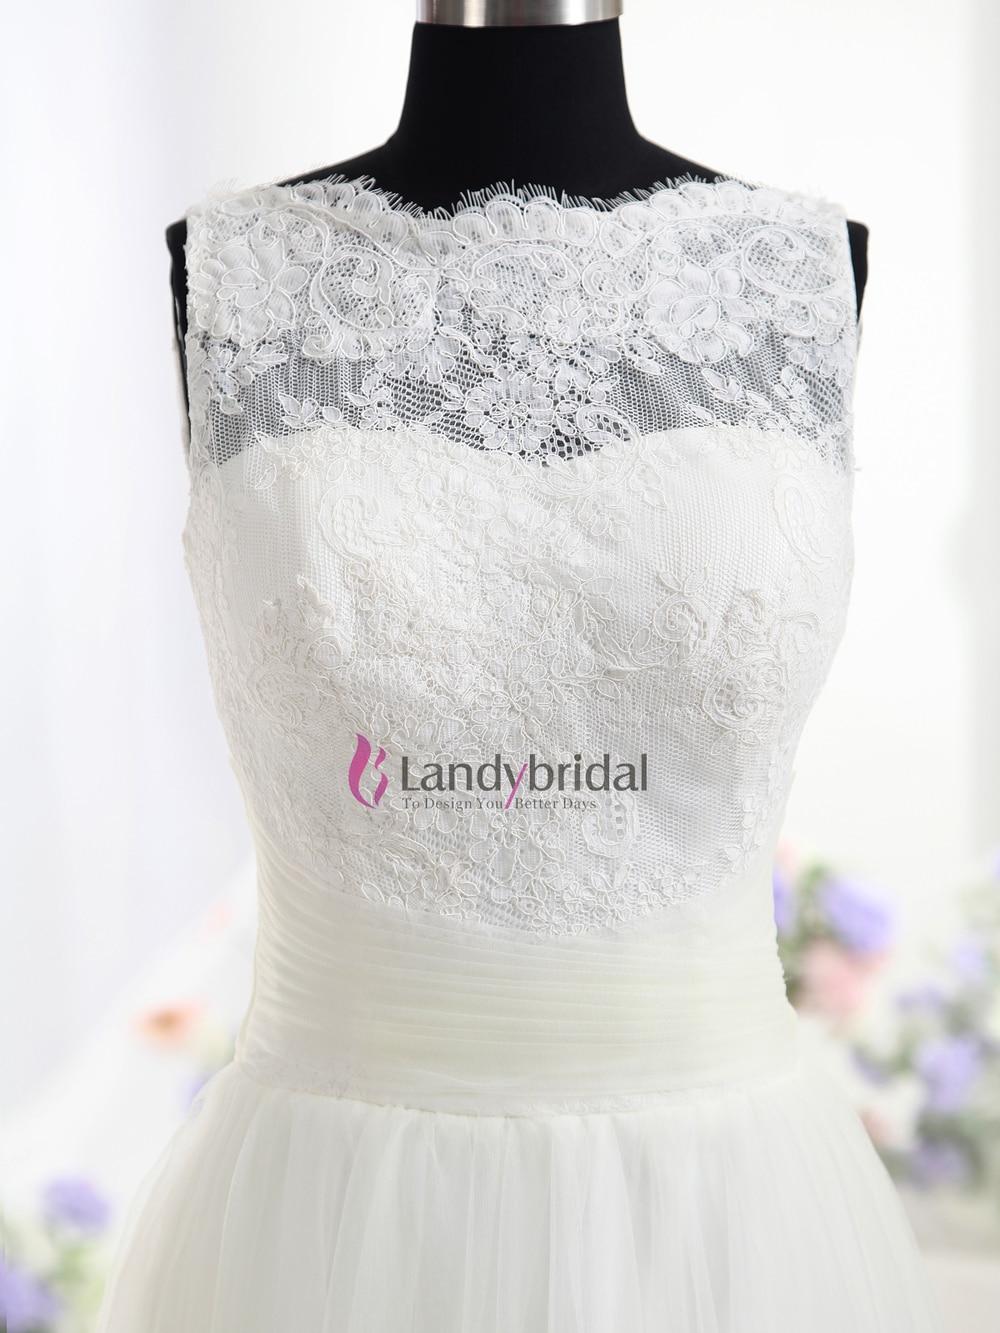 wedding dresses tank top style tank top wedding dresses Tank Top Style Wedding Dress Gommap Blog